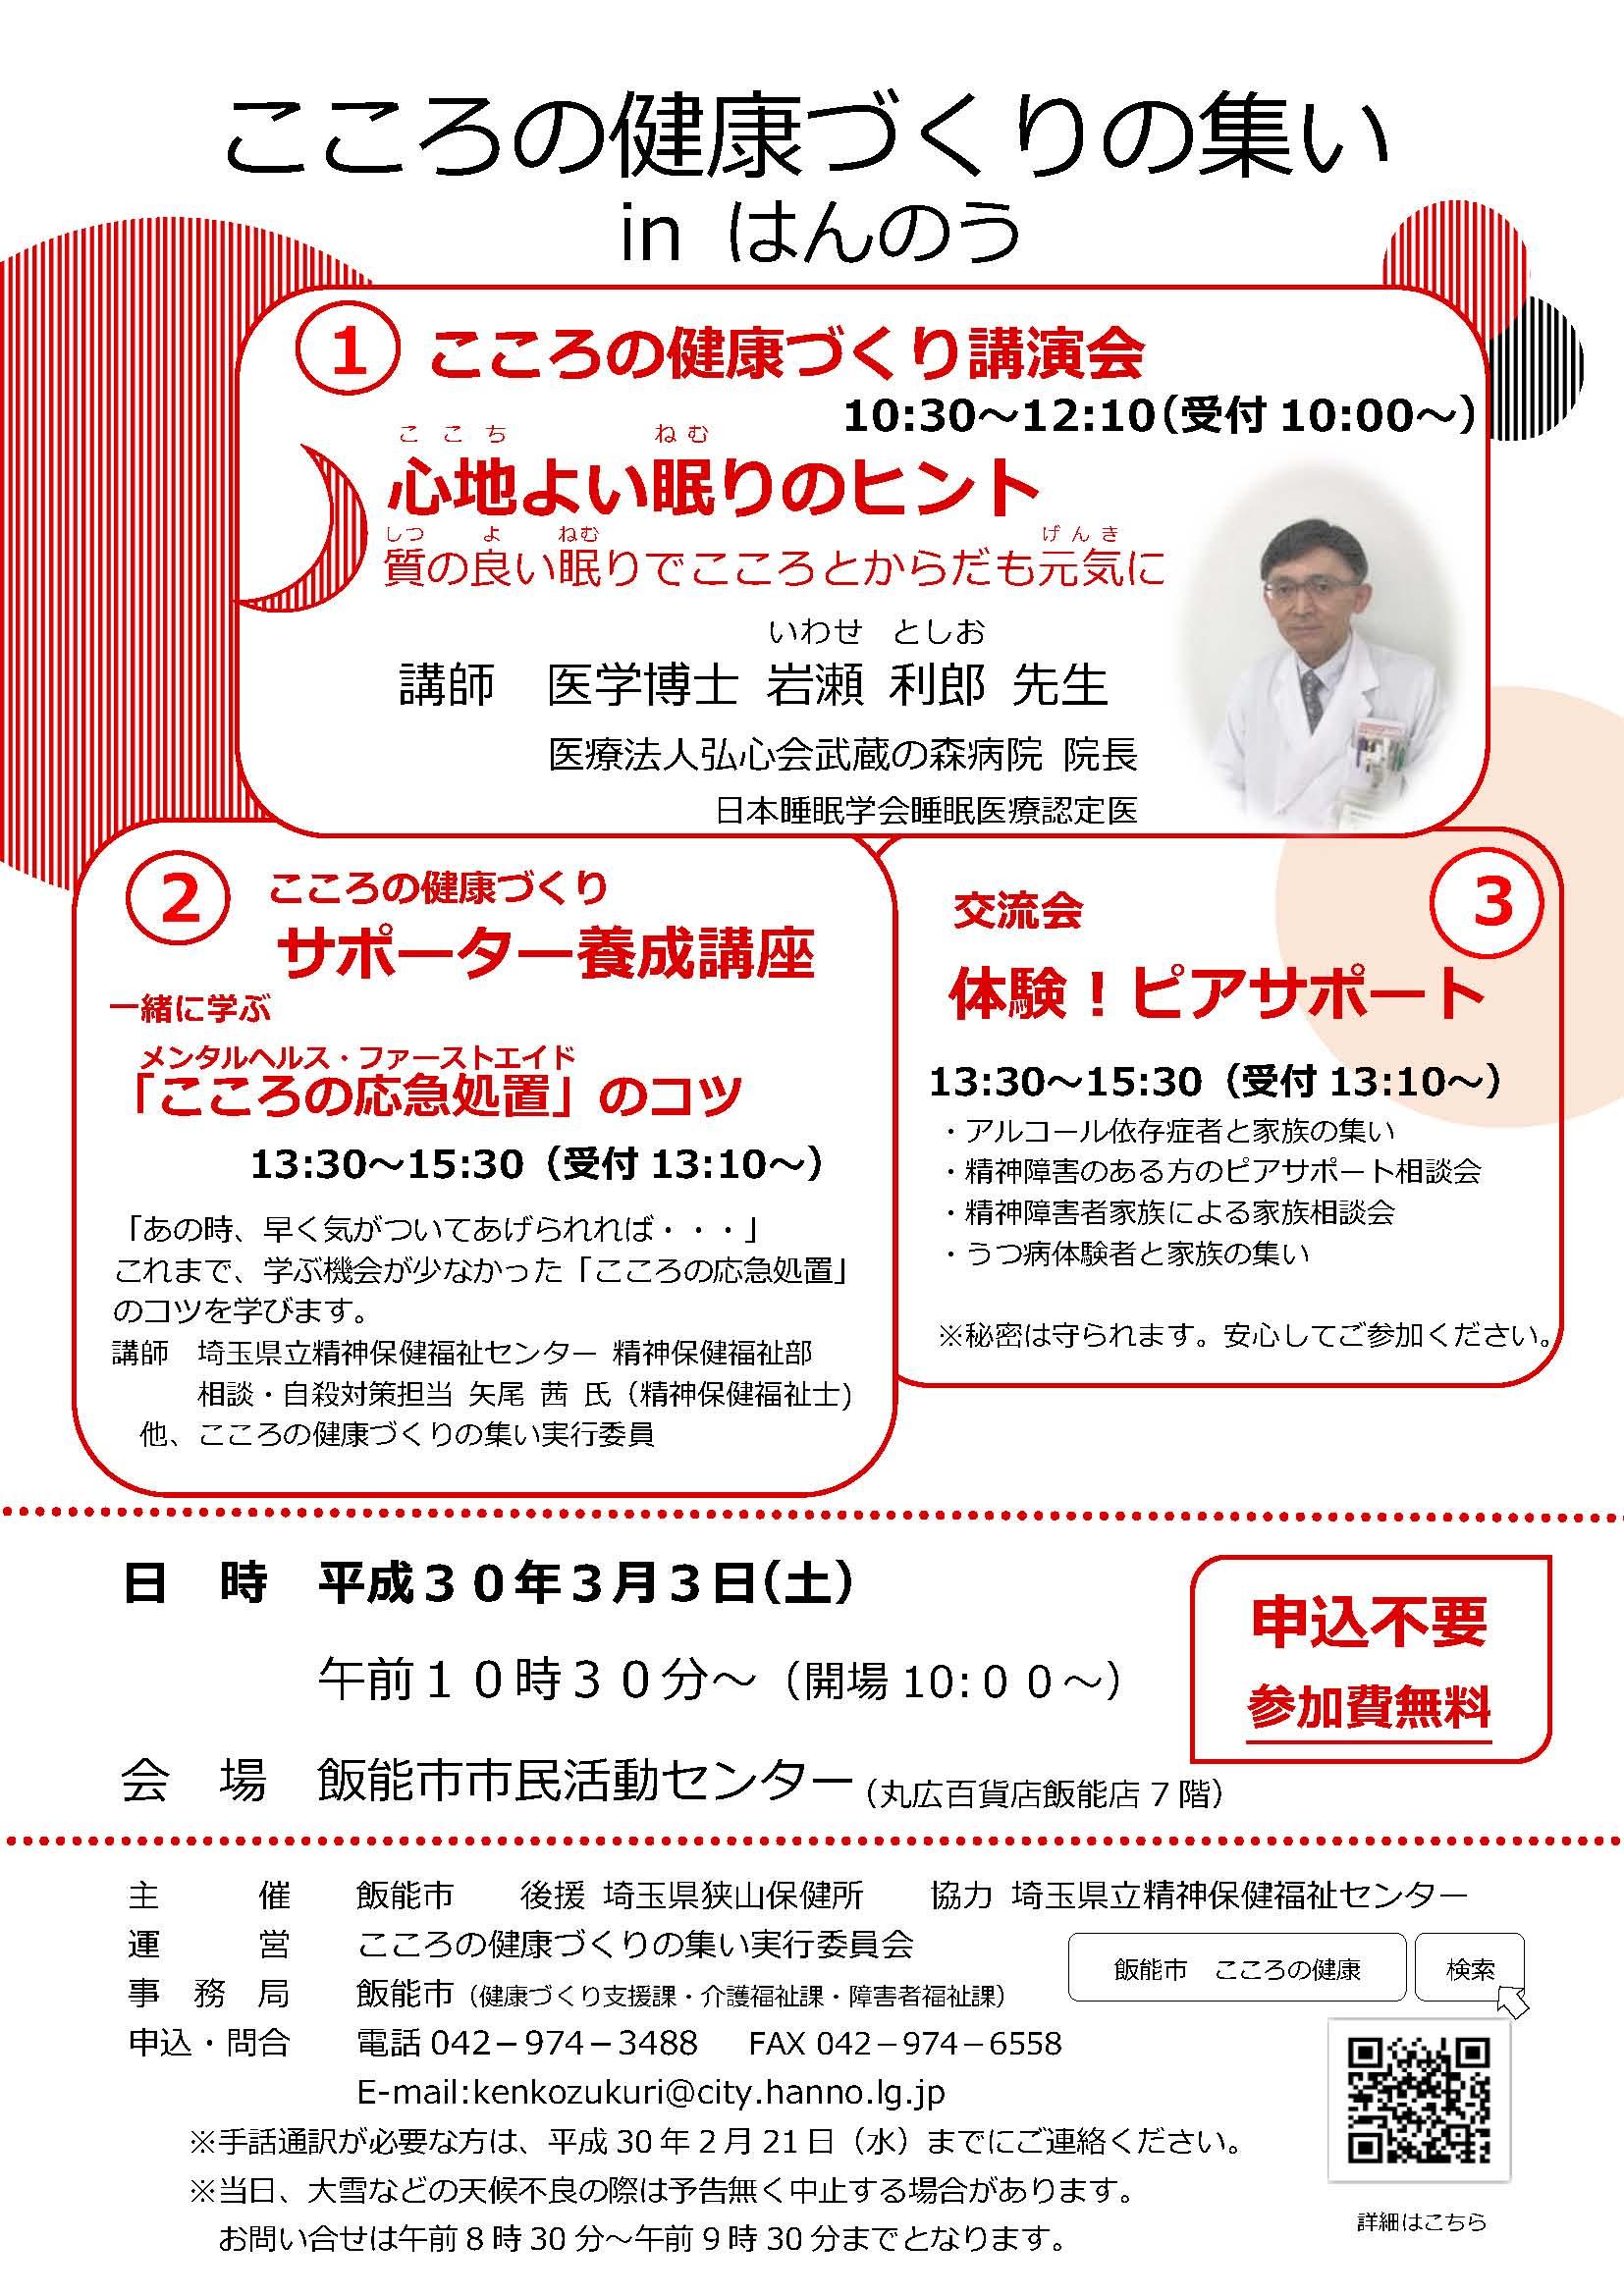 http://www.h-g-c.jp/blog/2018/02/03/hgc20180203.jpg